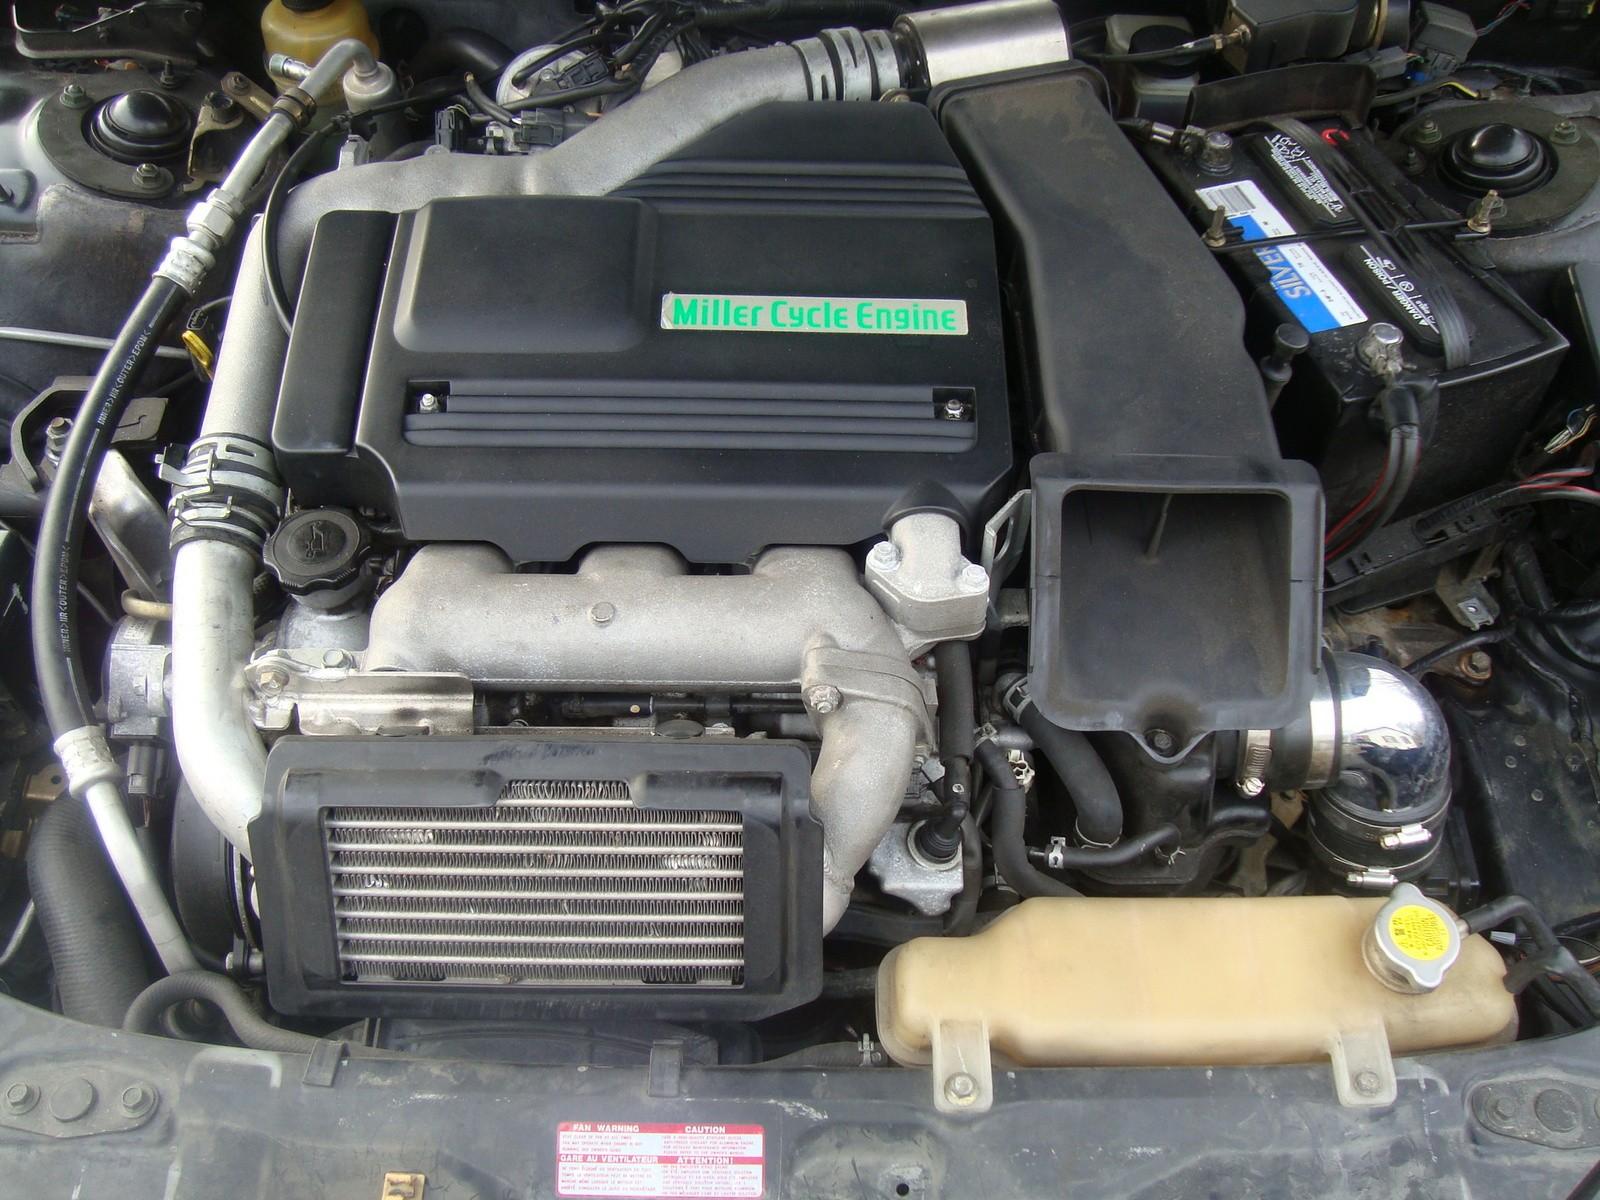 mazda millenia engine diagram mazda millenia engine gallery rh detoxicrecenze com 1995 Mazda Millenia Engine Diagram 2001 Mazda Millenia Water Pump